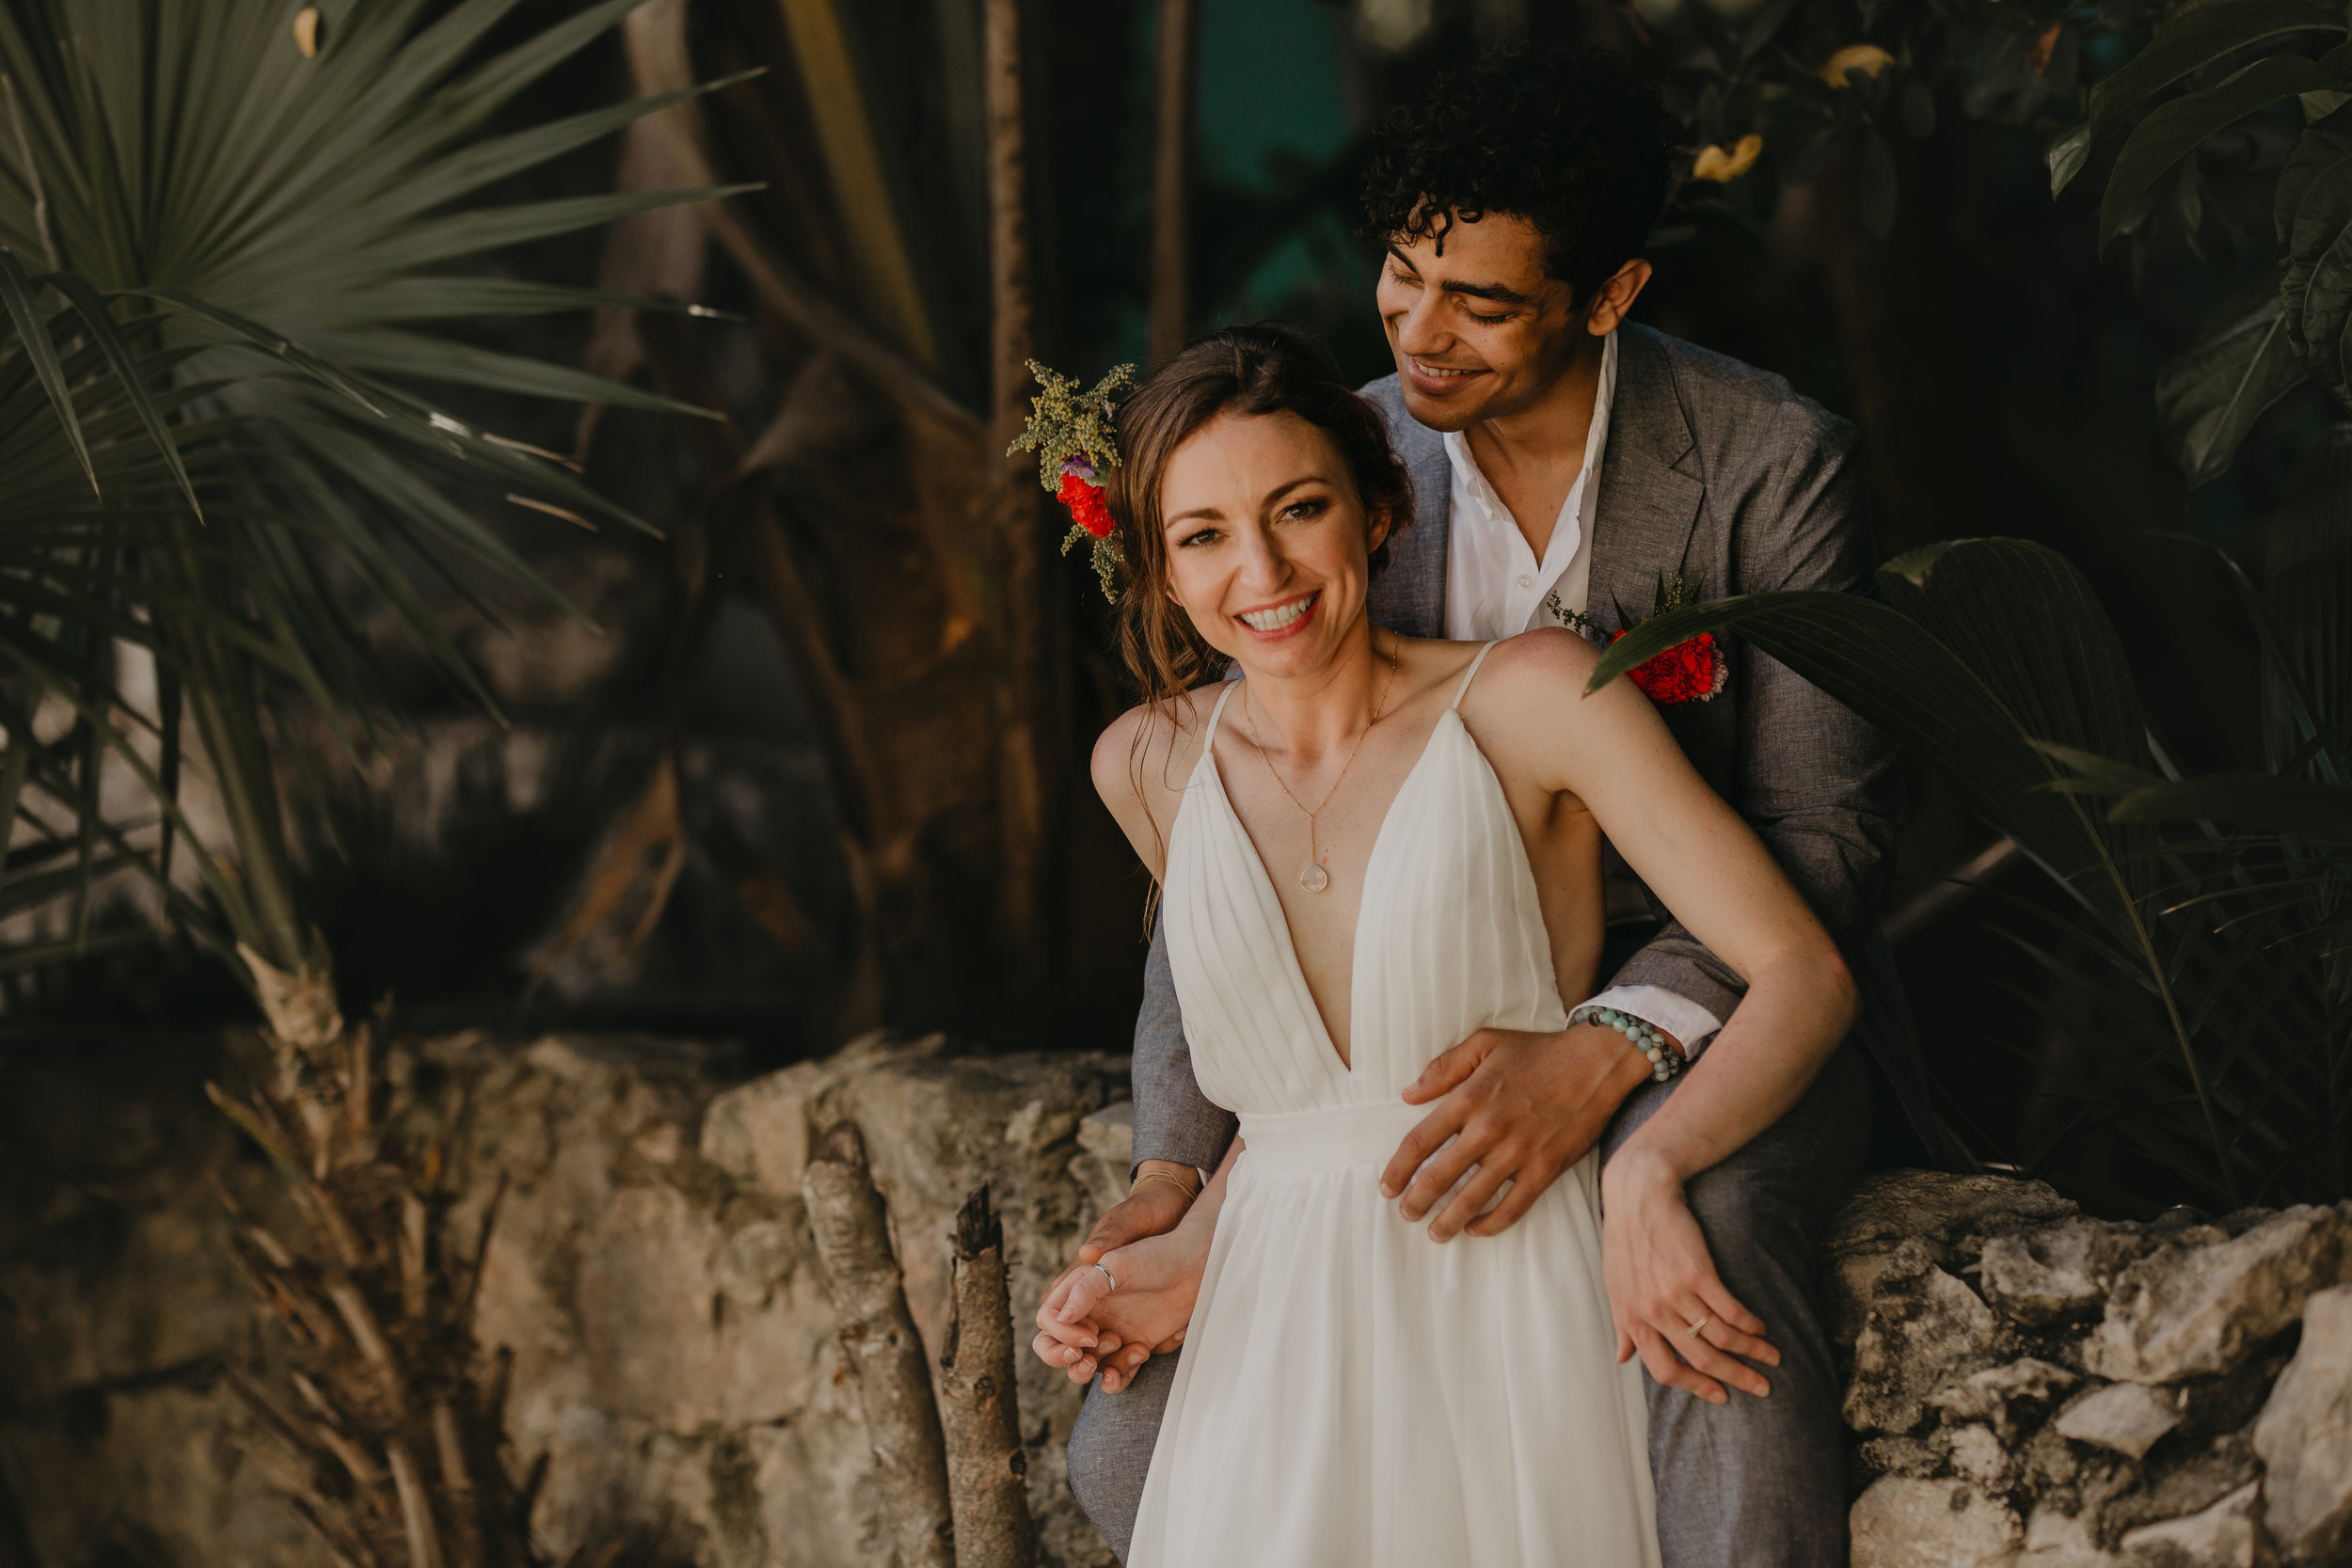 Nicole-Daacke-Photography-beachfront-akumal-destionation-wedding-tulum-mexico-elopement-photographer-destination-wedding-inspiration-sunset-champagne-pop-boho-bride-ocean-tropical-bohemian-tulum-wedding-photos-136.jpg